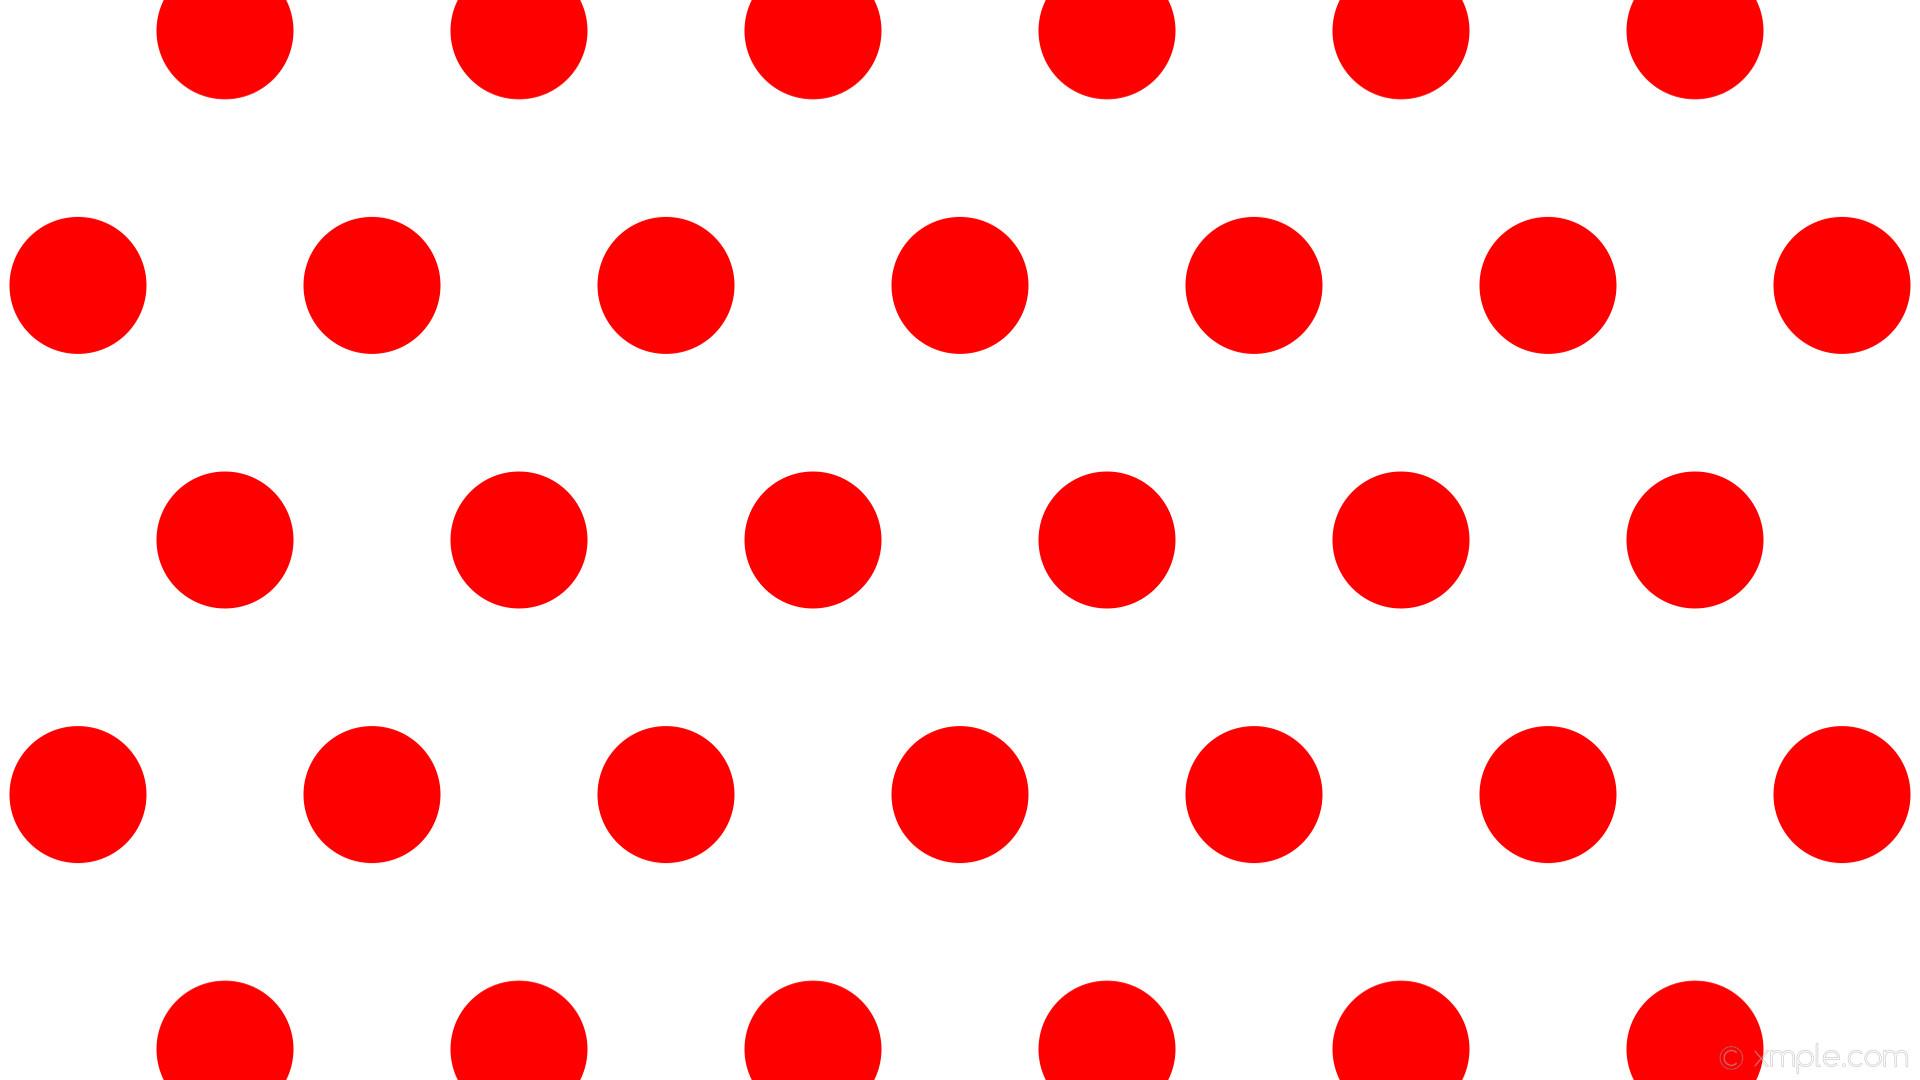 wallpaper white polka dots red hexagon #ffffff #ff0000 0° 137px 294px